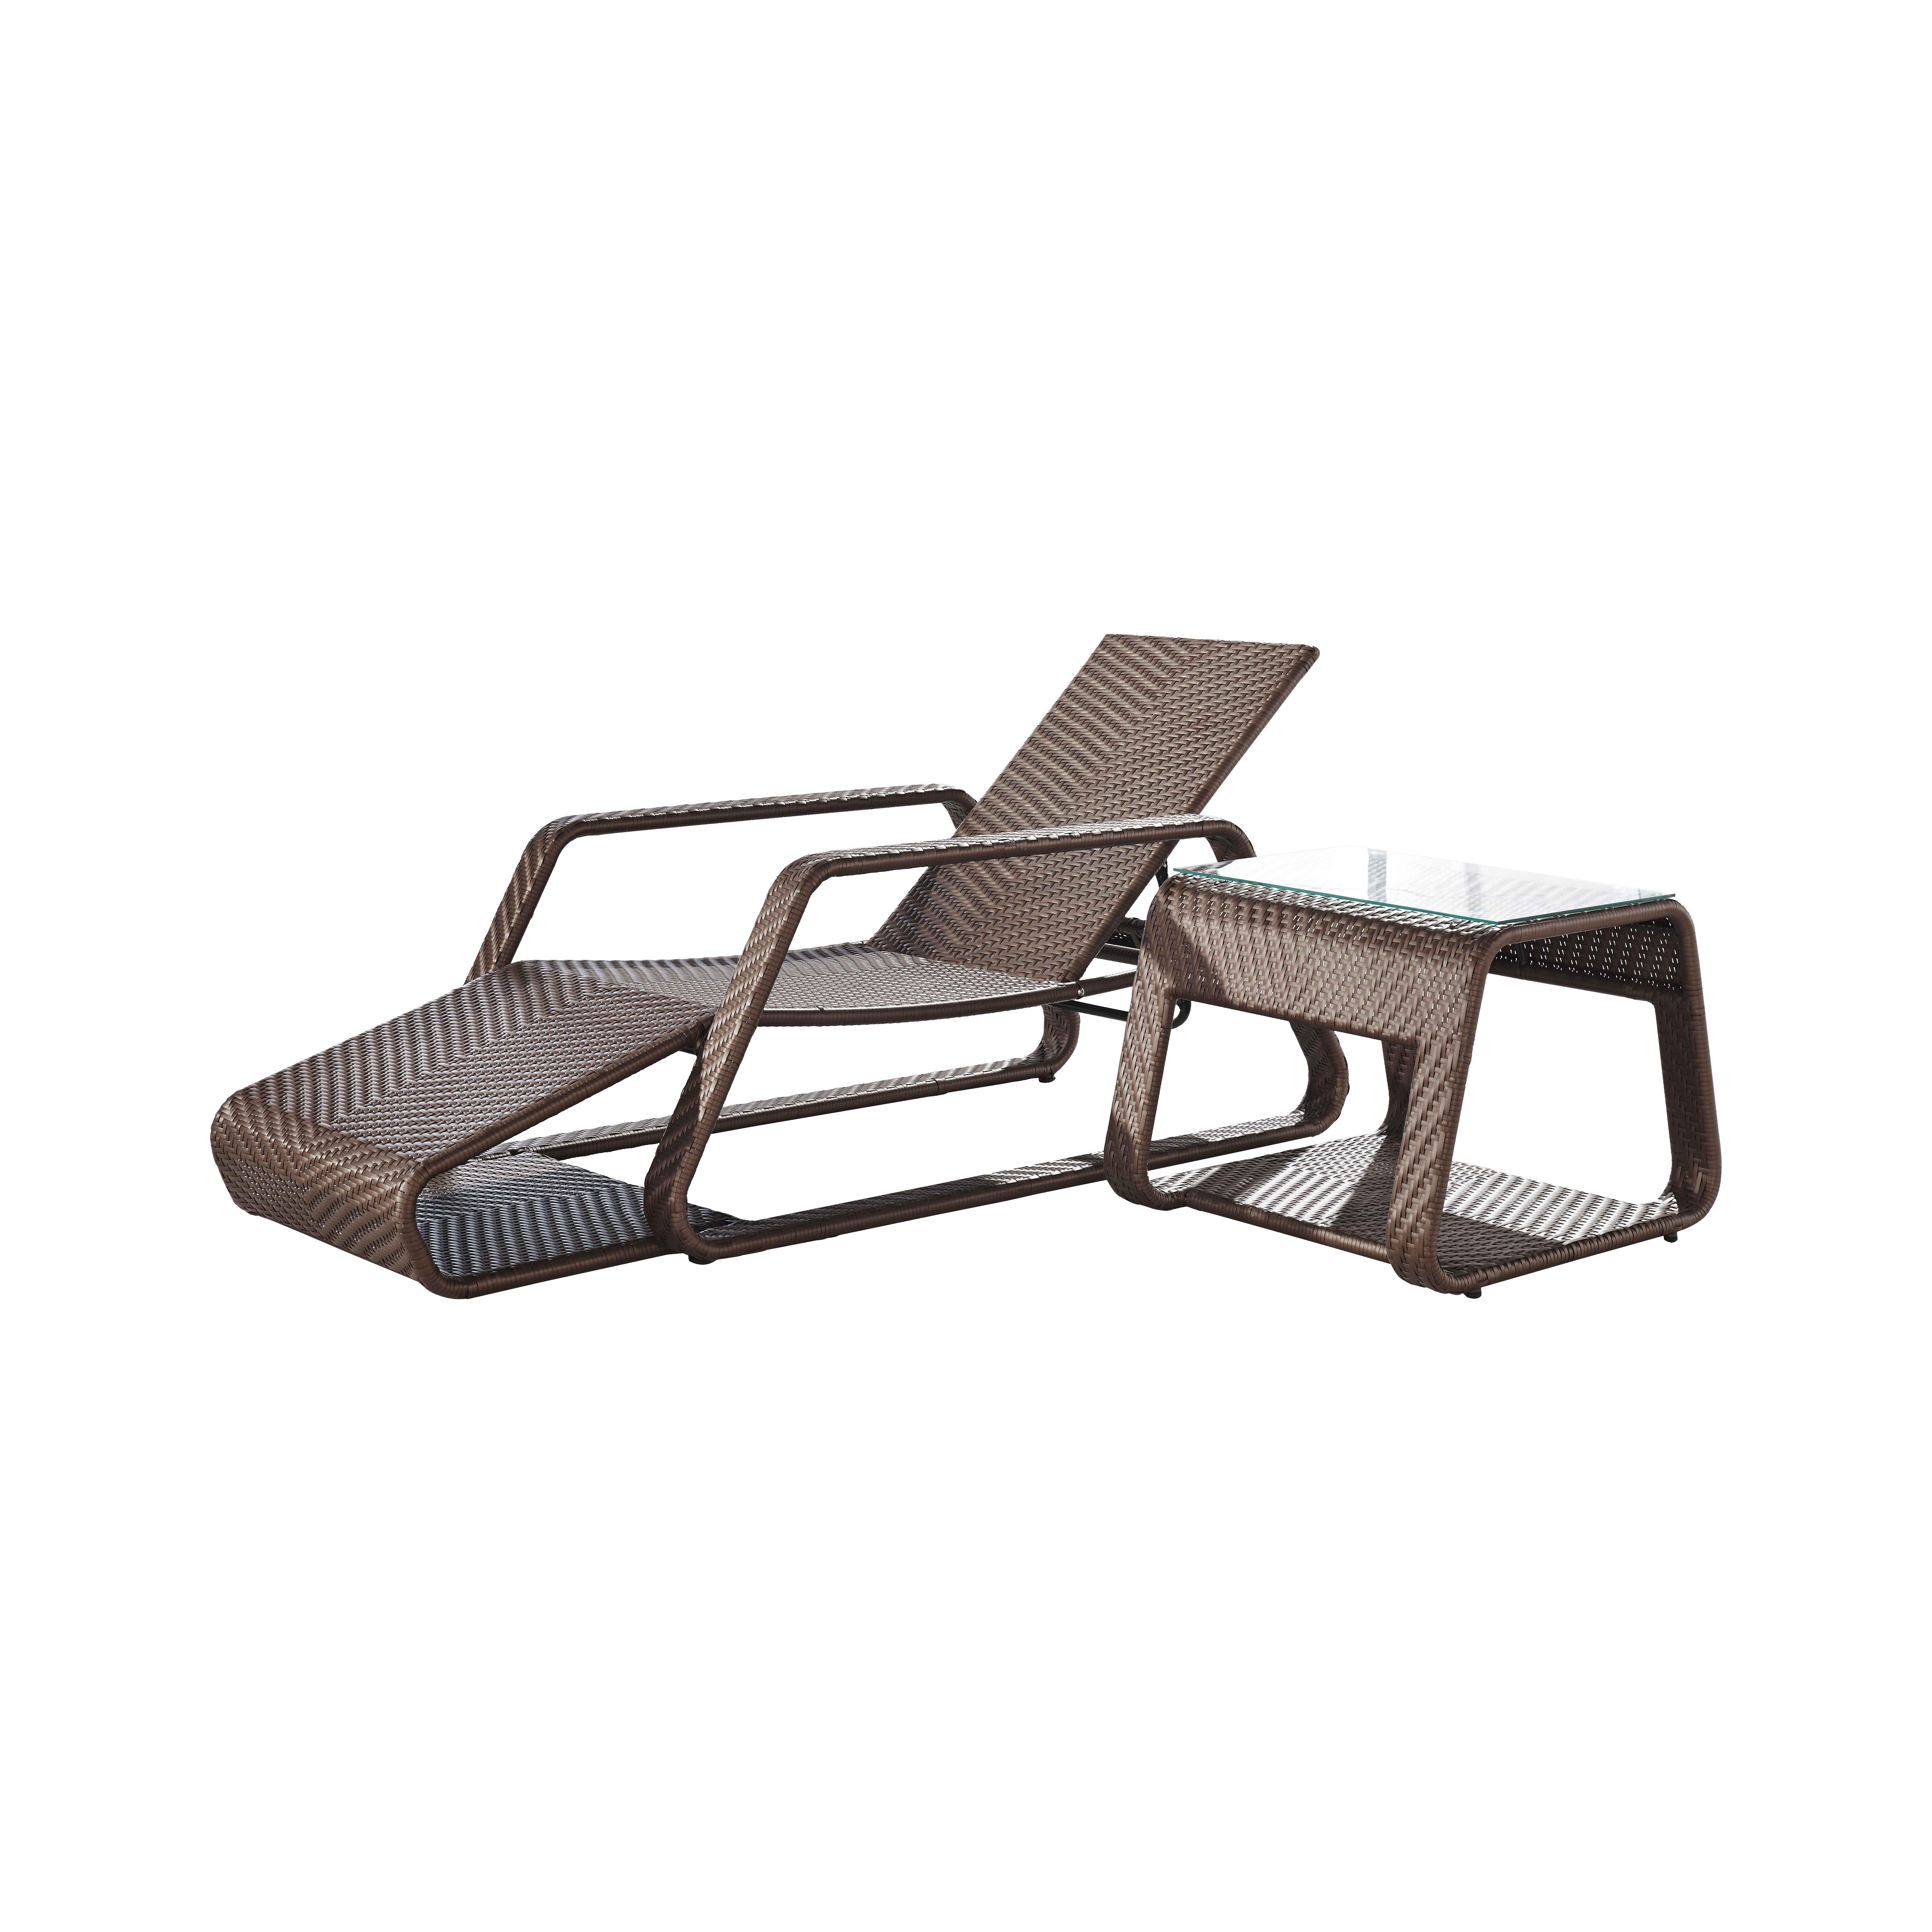 Ceets windsor 2 piece chaise lounge set wayfair for 2 chaise lounges